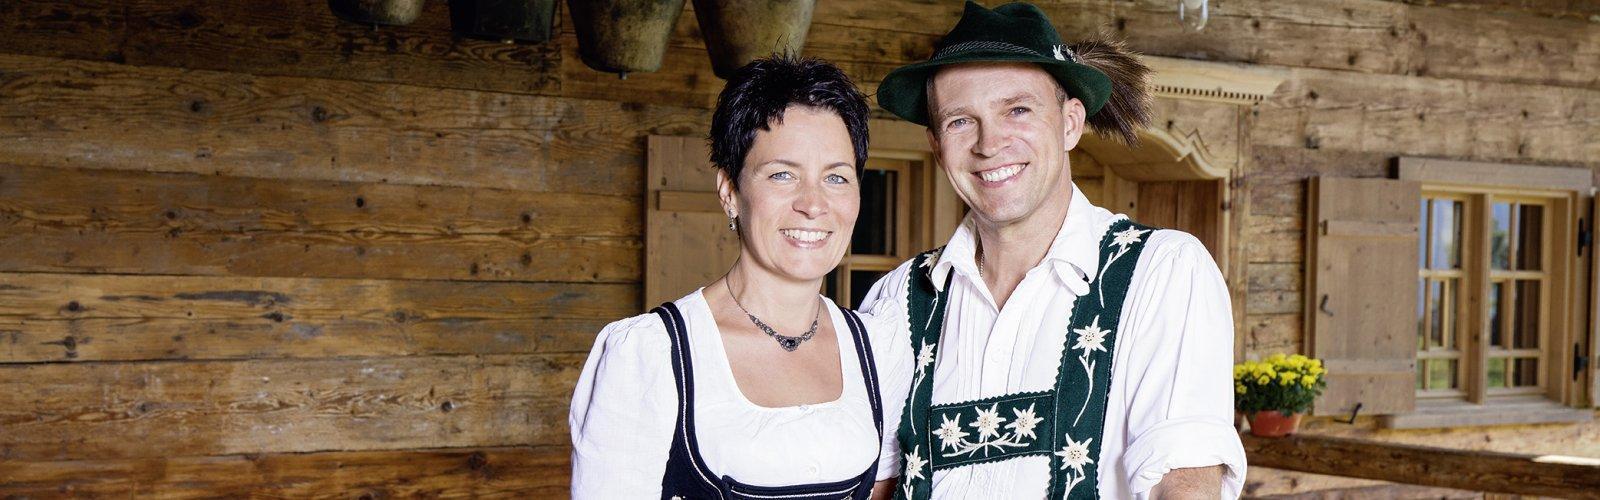 Patricia und Hans Lipp